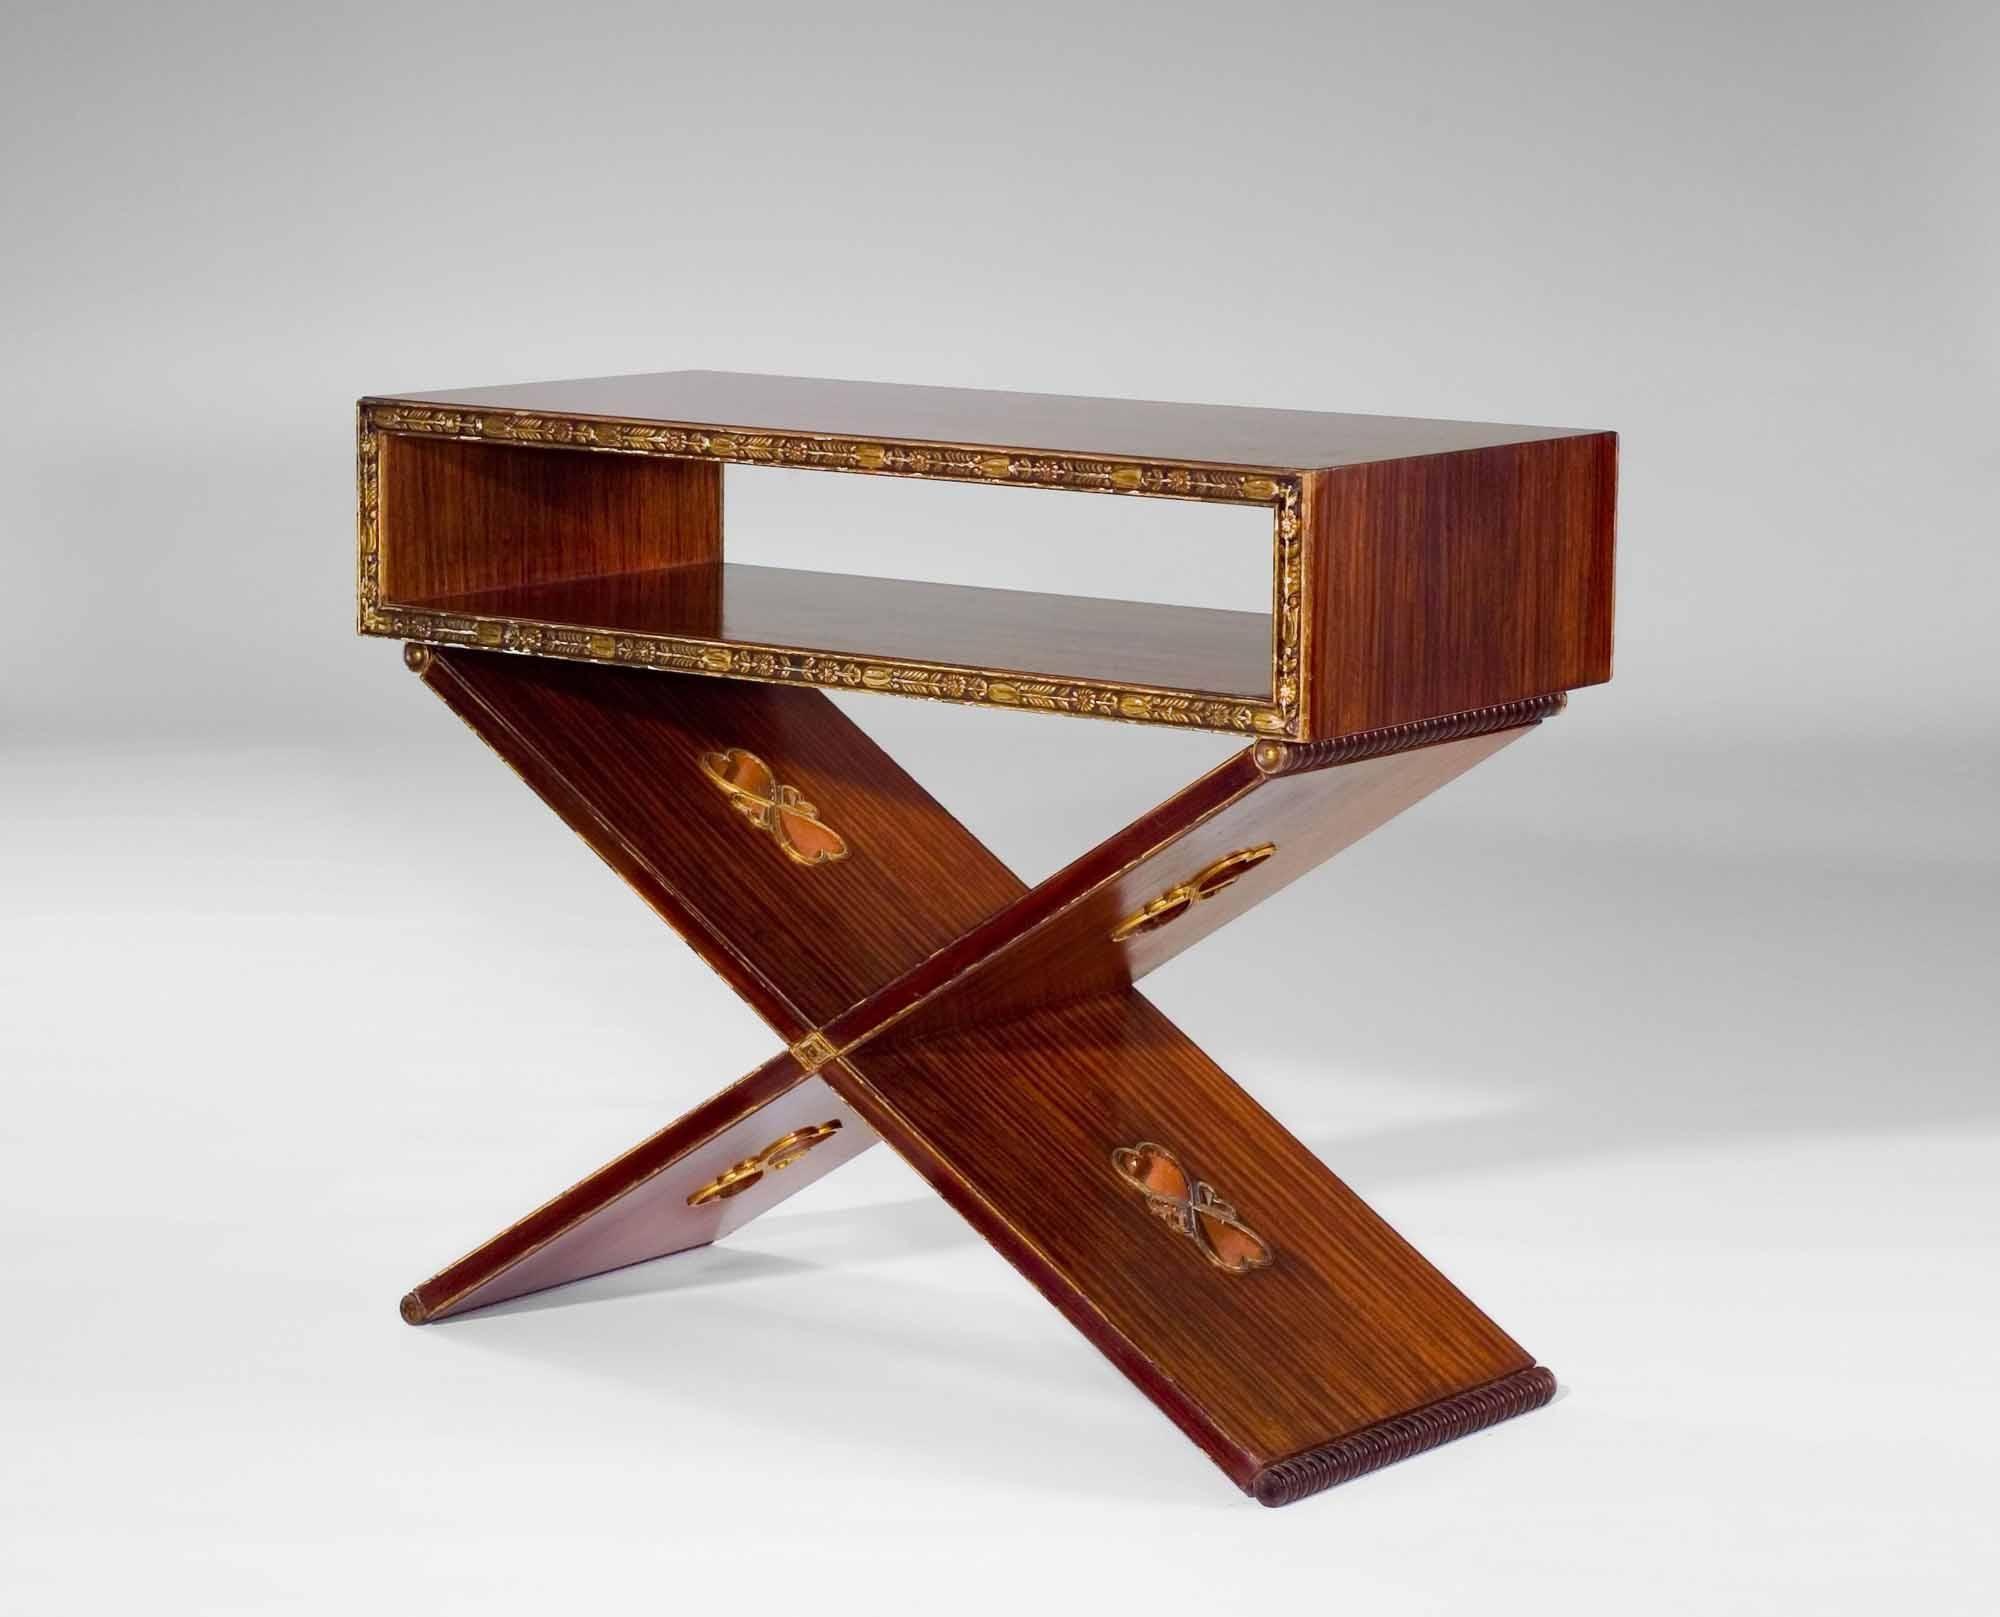 Josef Hoffmann Small Library Table Wiener Werkstatte Wiener  # Werkbund Muebles